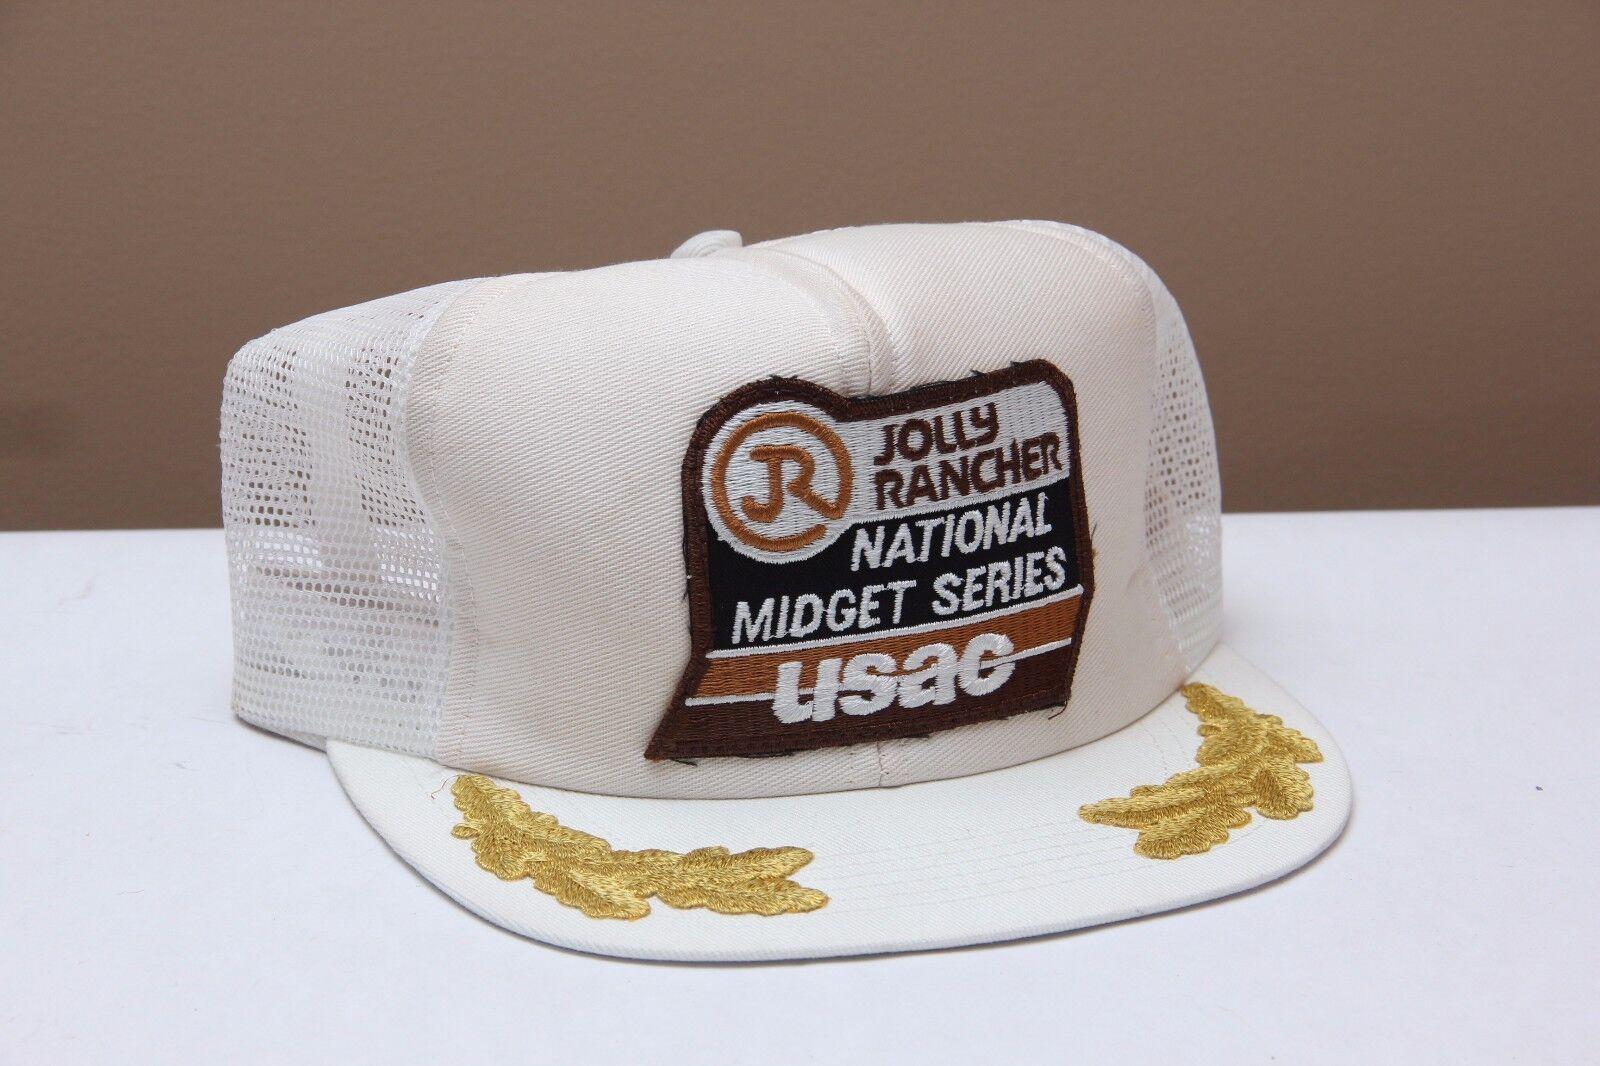 Vintage Jolly Rancher USAC National Midget Trucker Series Hat Cap Mesh Trucker Midget Snapback a30817